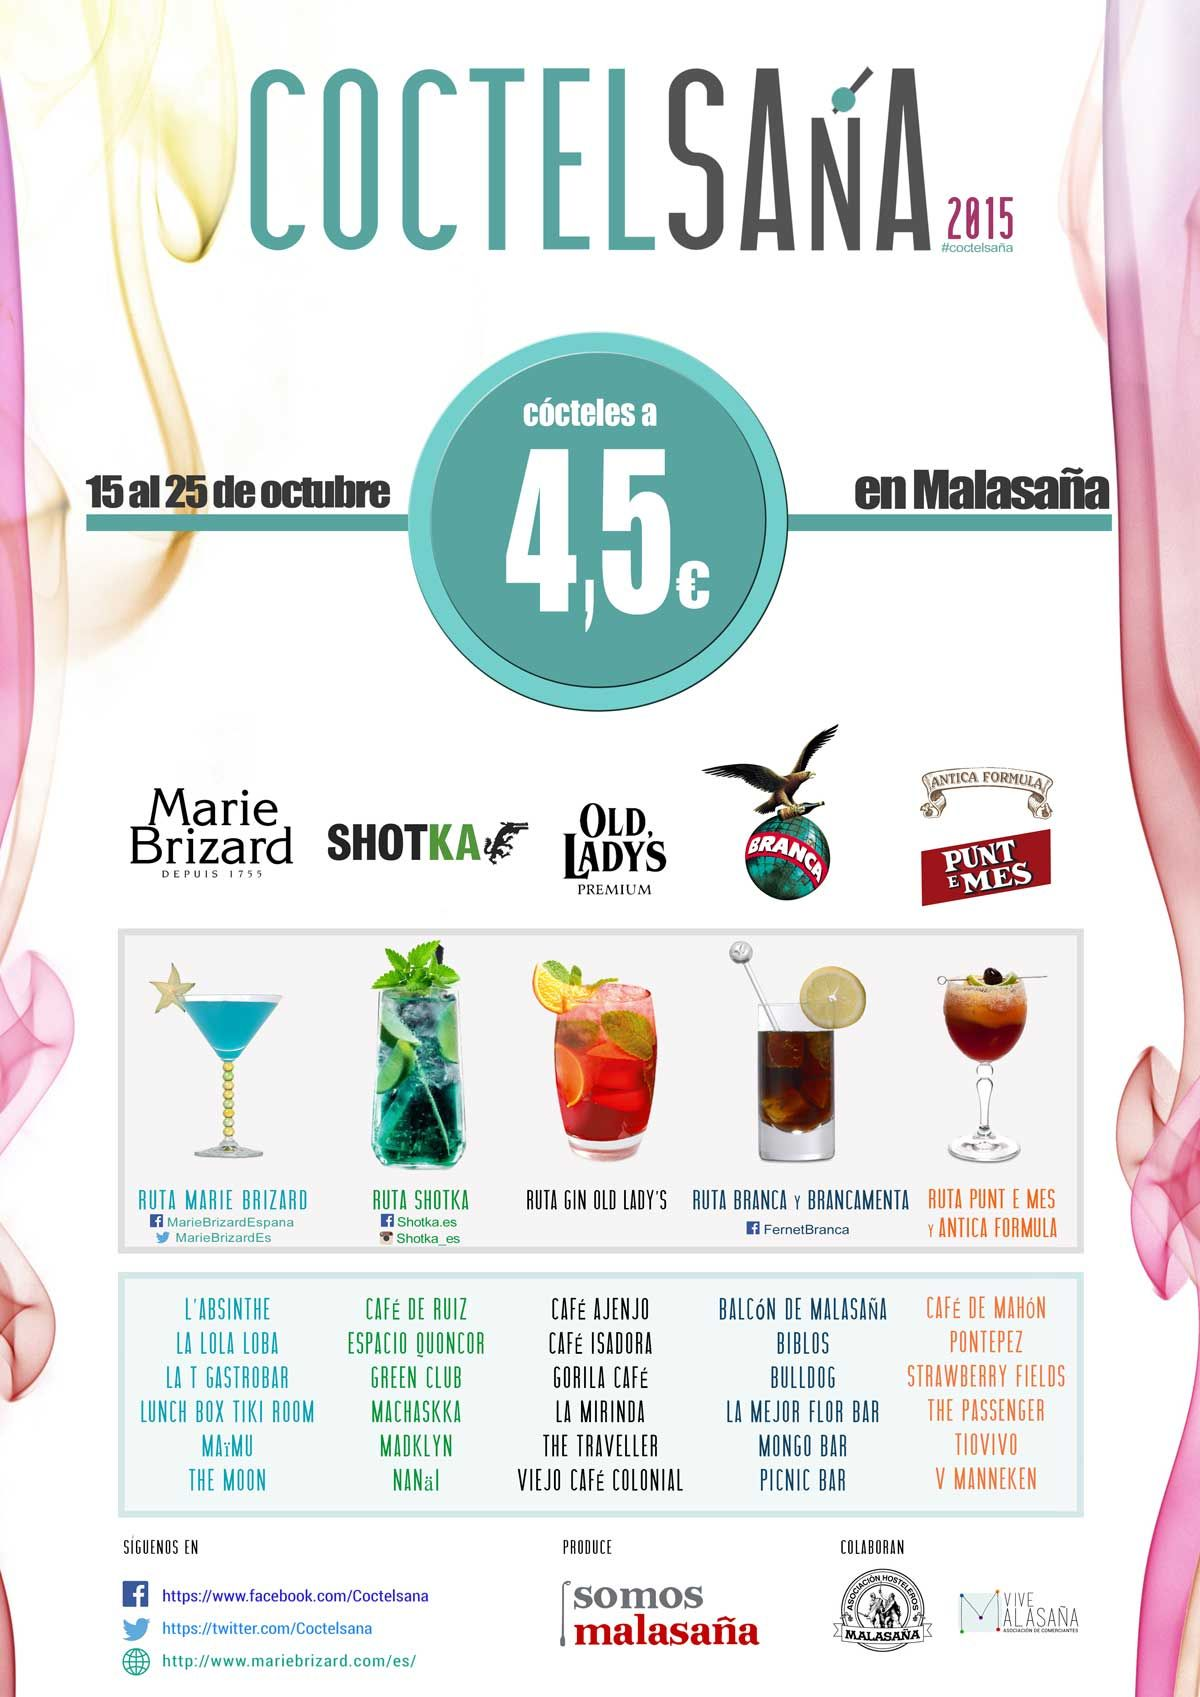 Cartel oficial de Coctelsaña 2015 (pincha para ampliar)